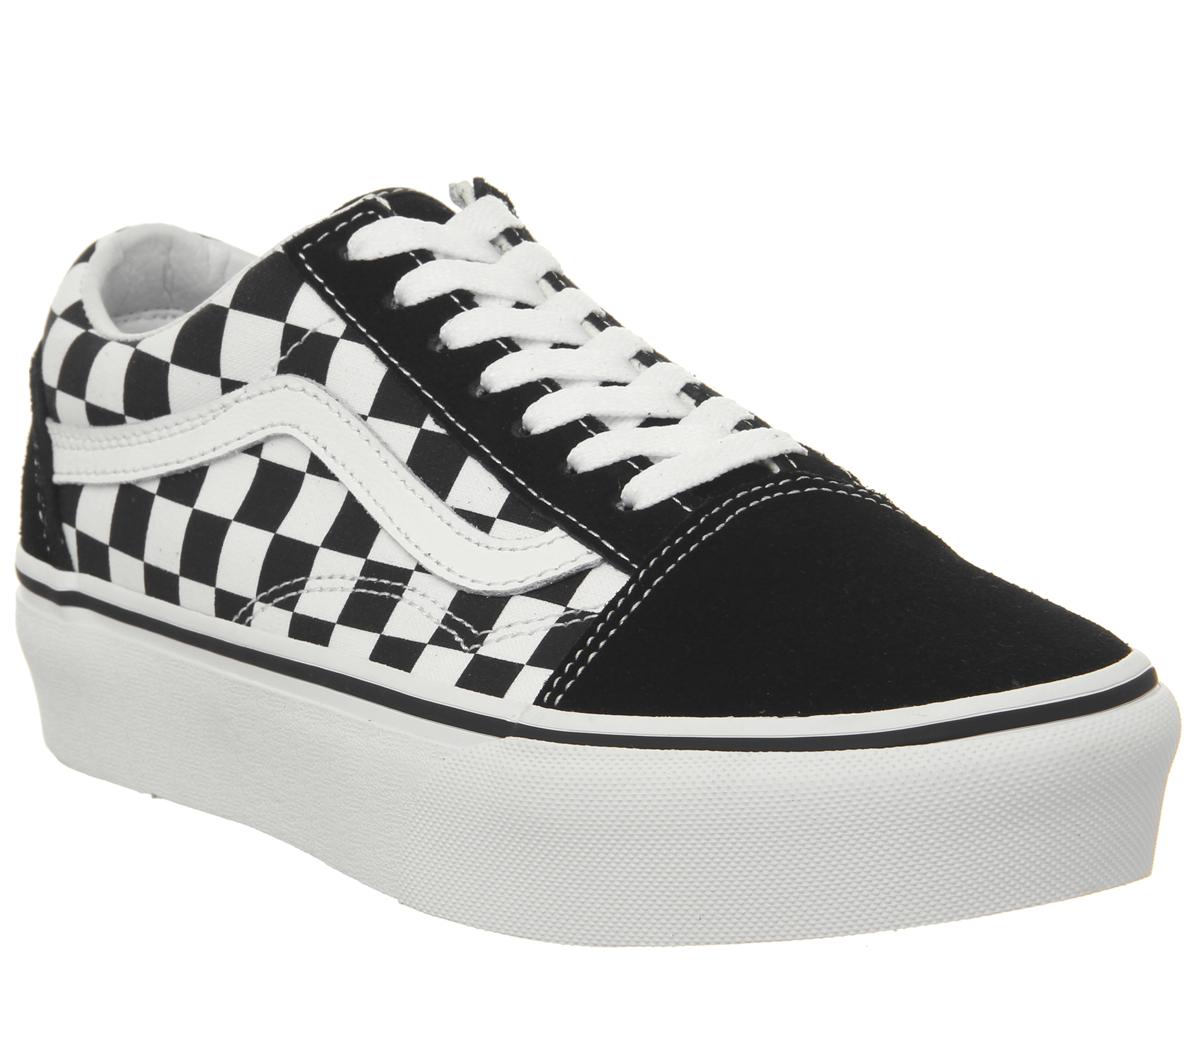 5b216c98fd1 Sentinel Womens Vans Old Skool Platform Trainers Black Checkerboard True  White Trainers S